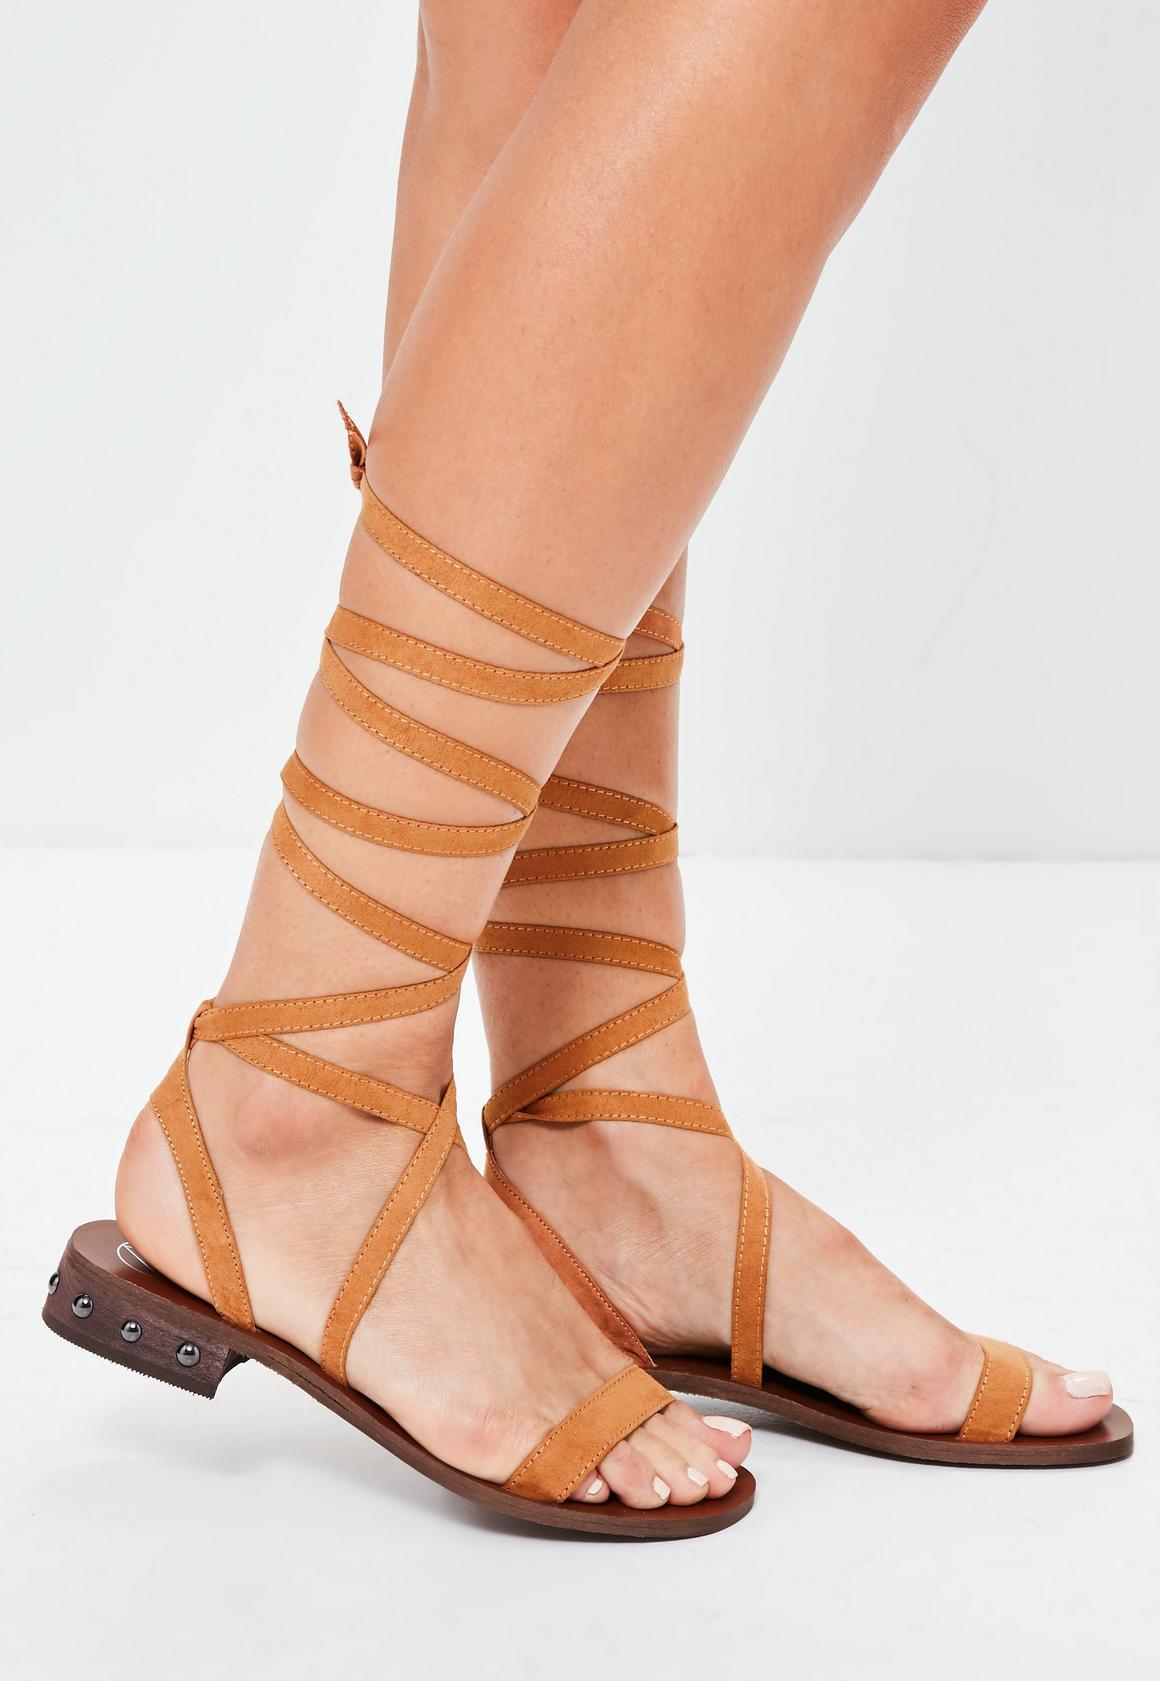 Flat heel sandals images - Previous Next